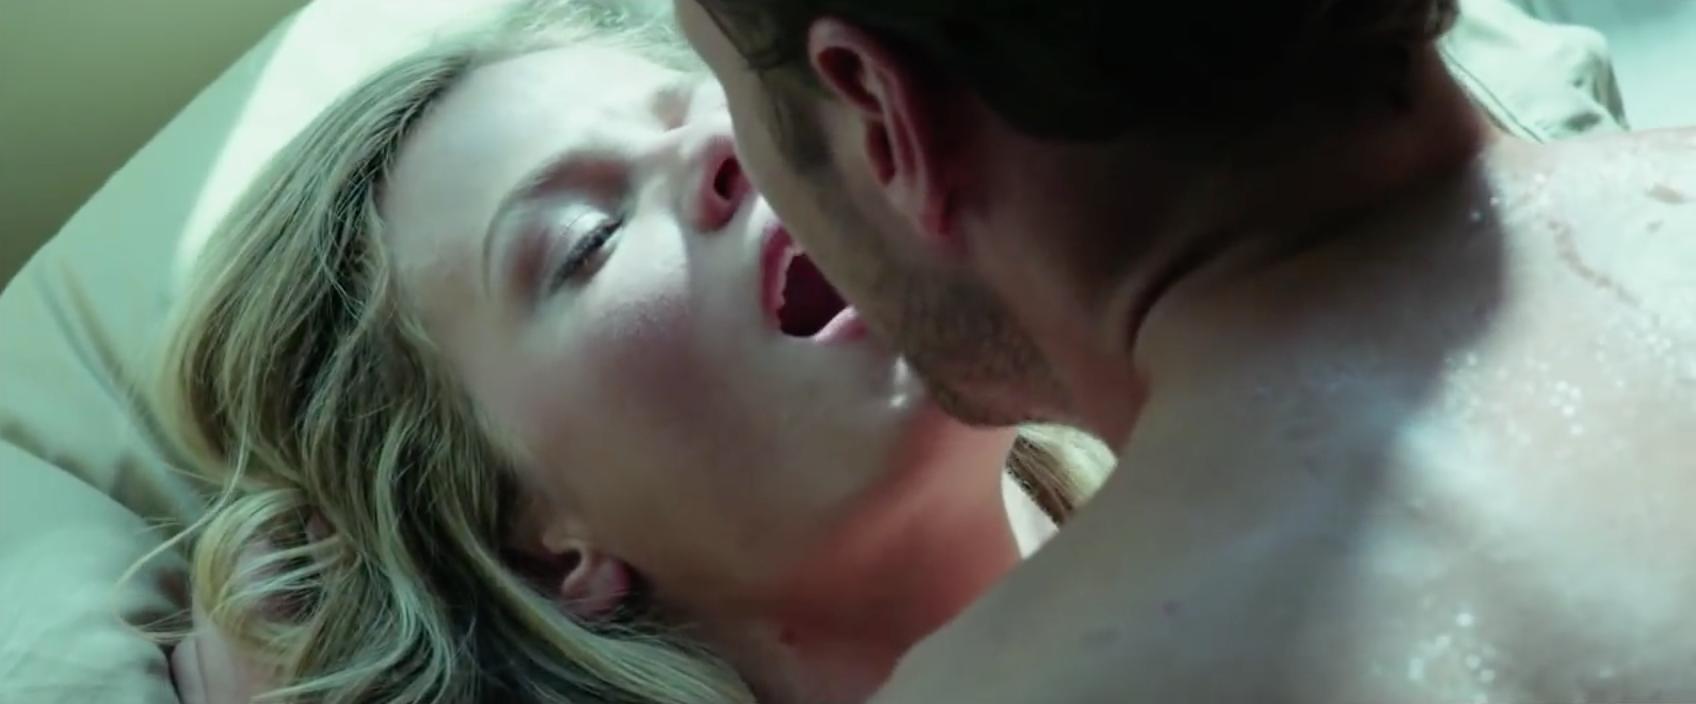 naomi watts sex scene gross misconduct